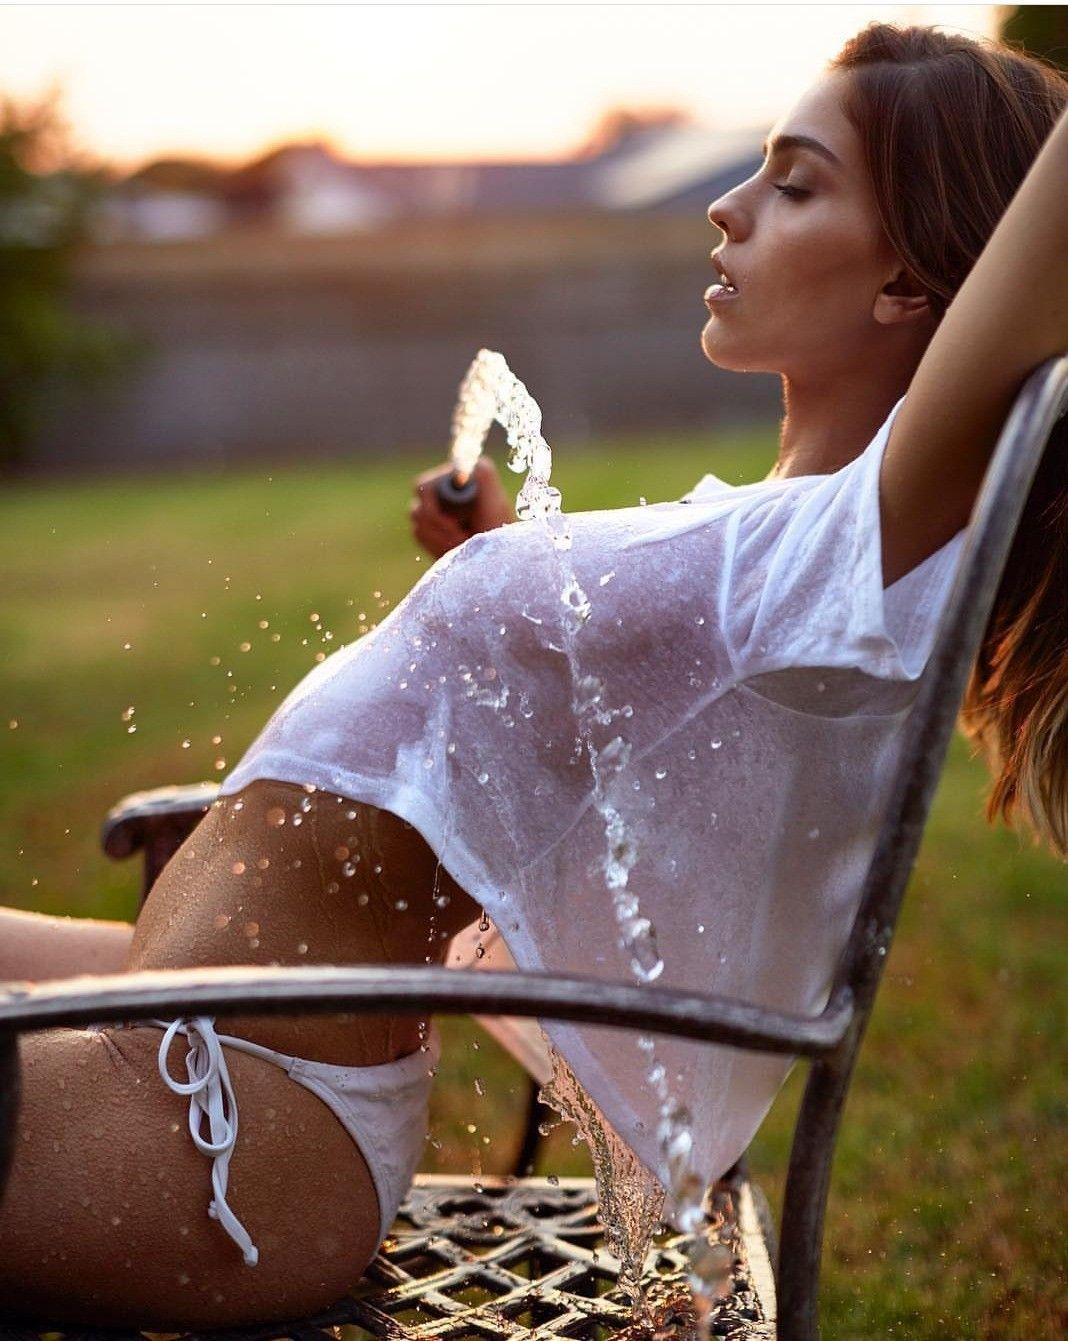 Pin by Jay on Women   Cool girl, Wet t shirt, Beautiful